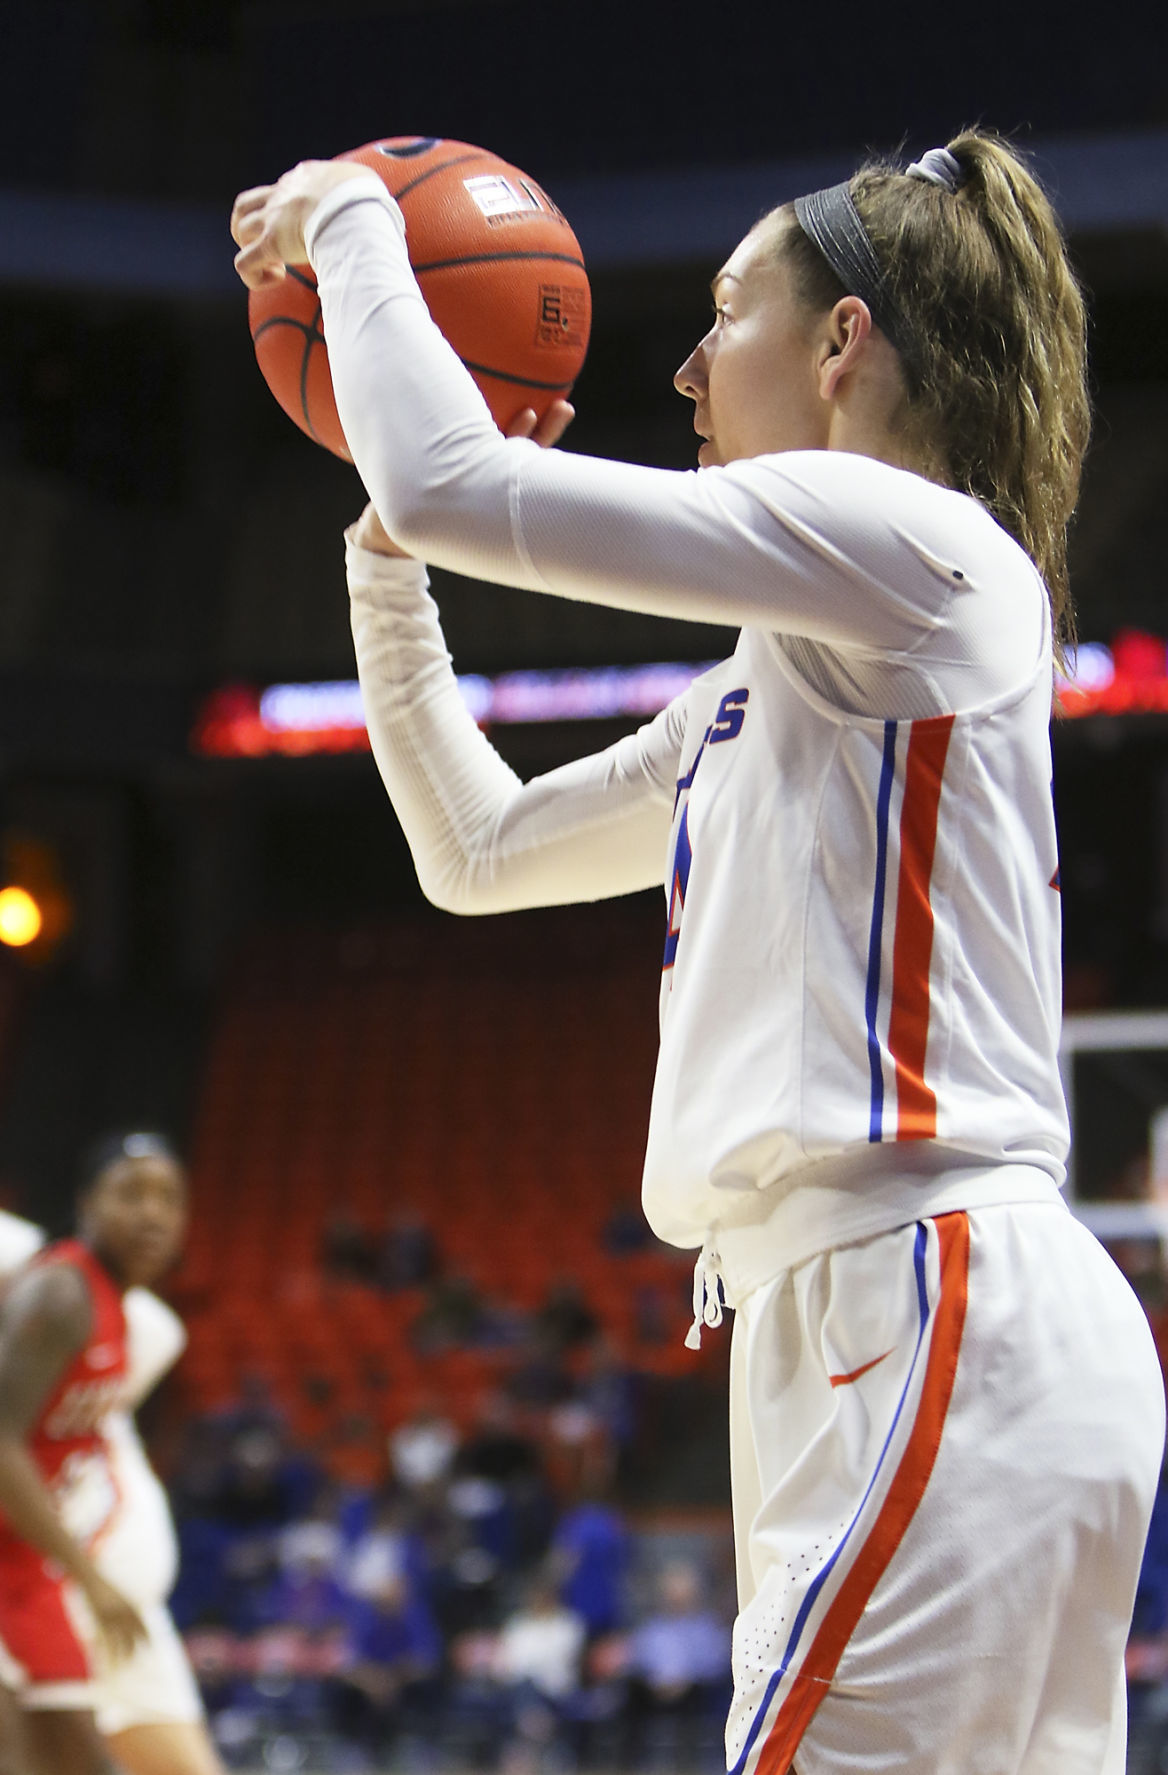 BSU vs UNLV women's basketball